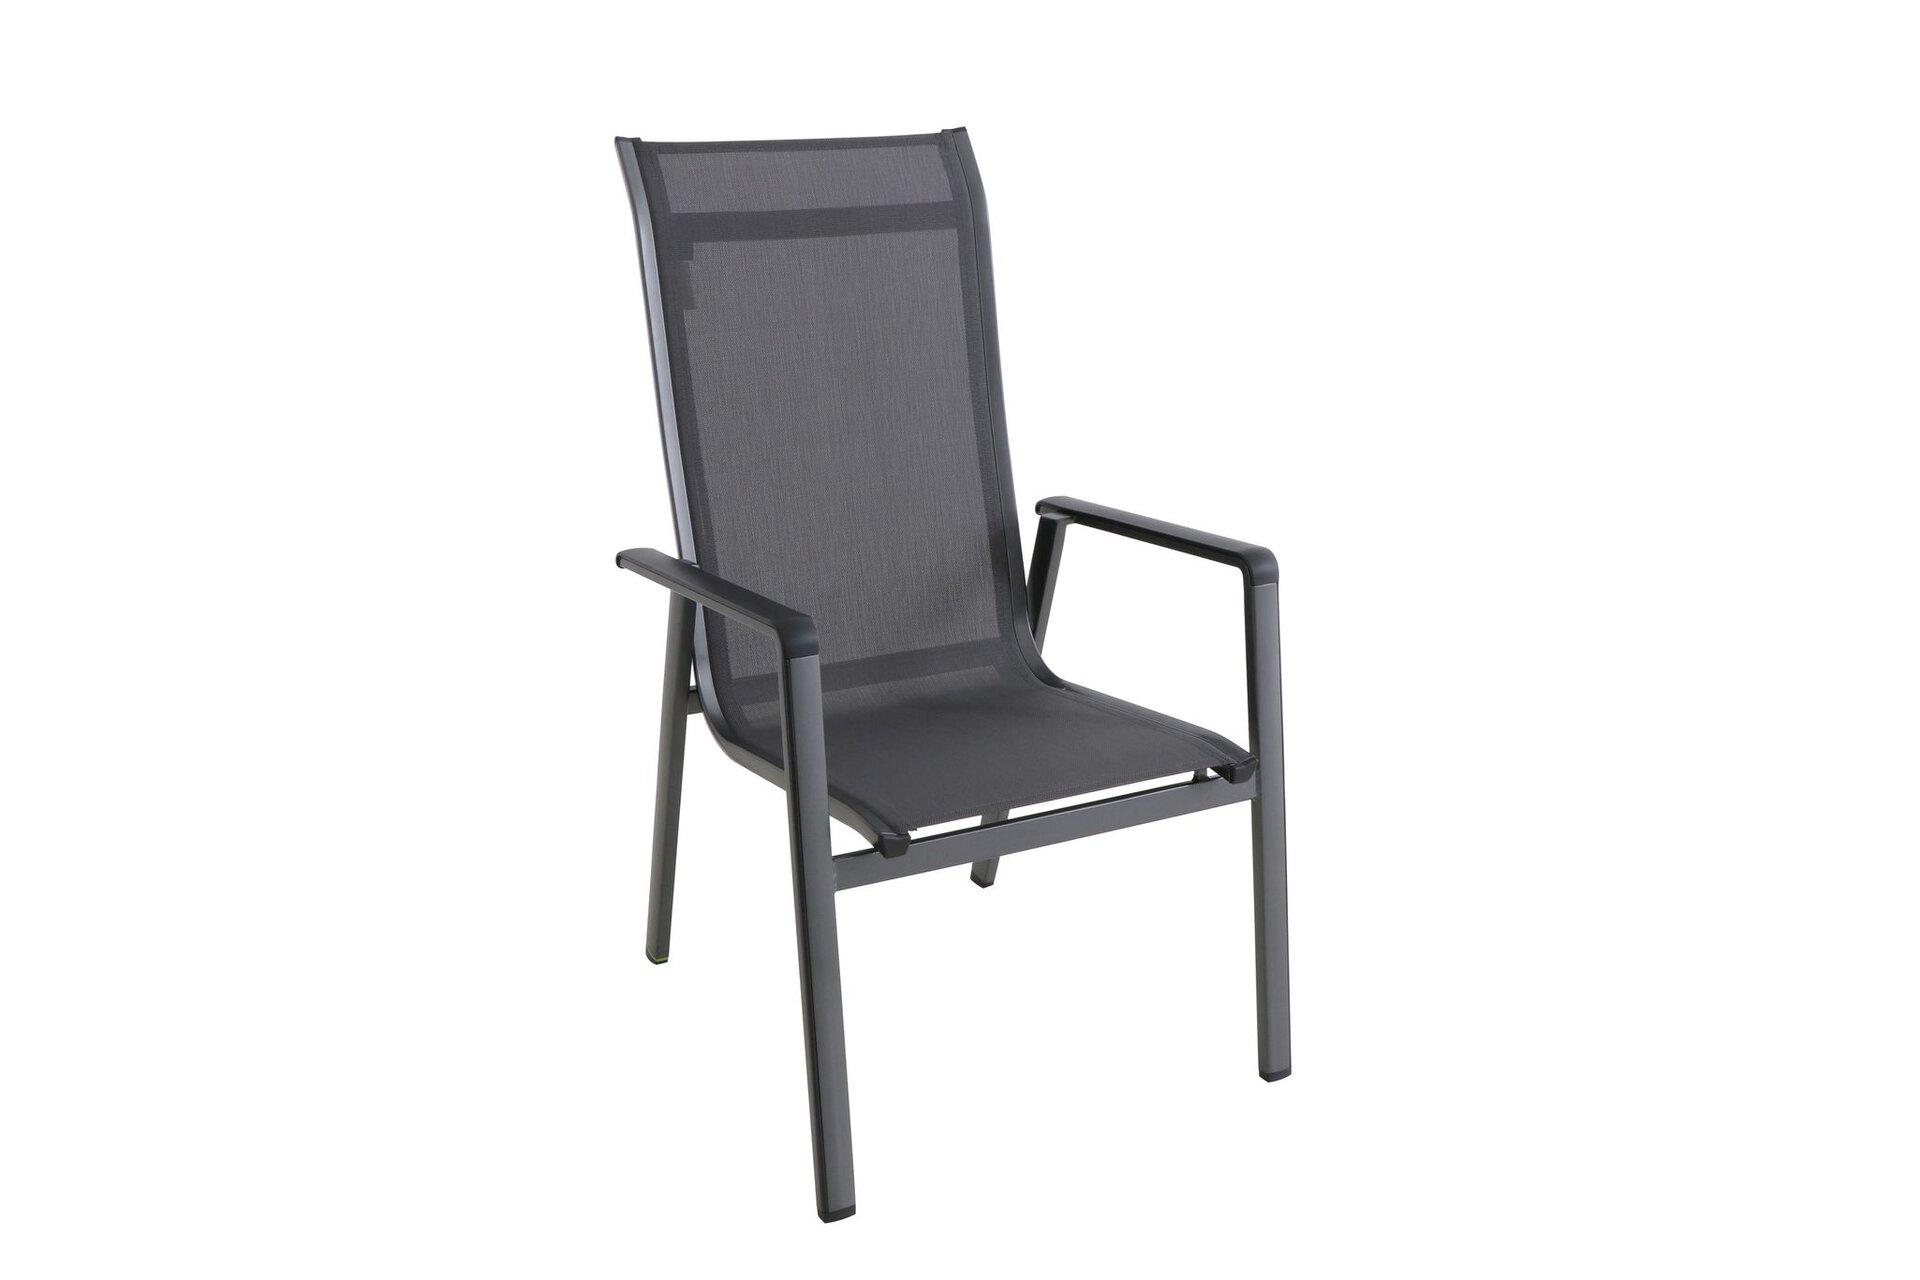 Stapelstuhl KEDLINE Outdoor Textil schwarz 65 x 98 x 69 cm